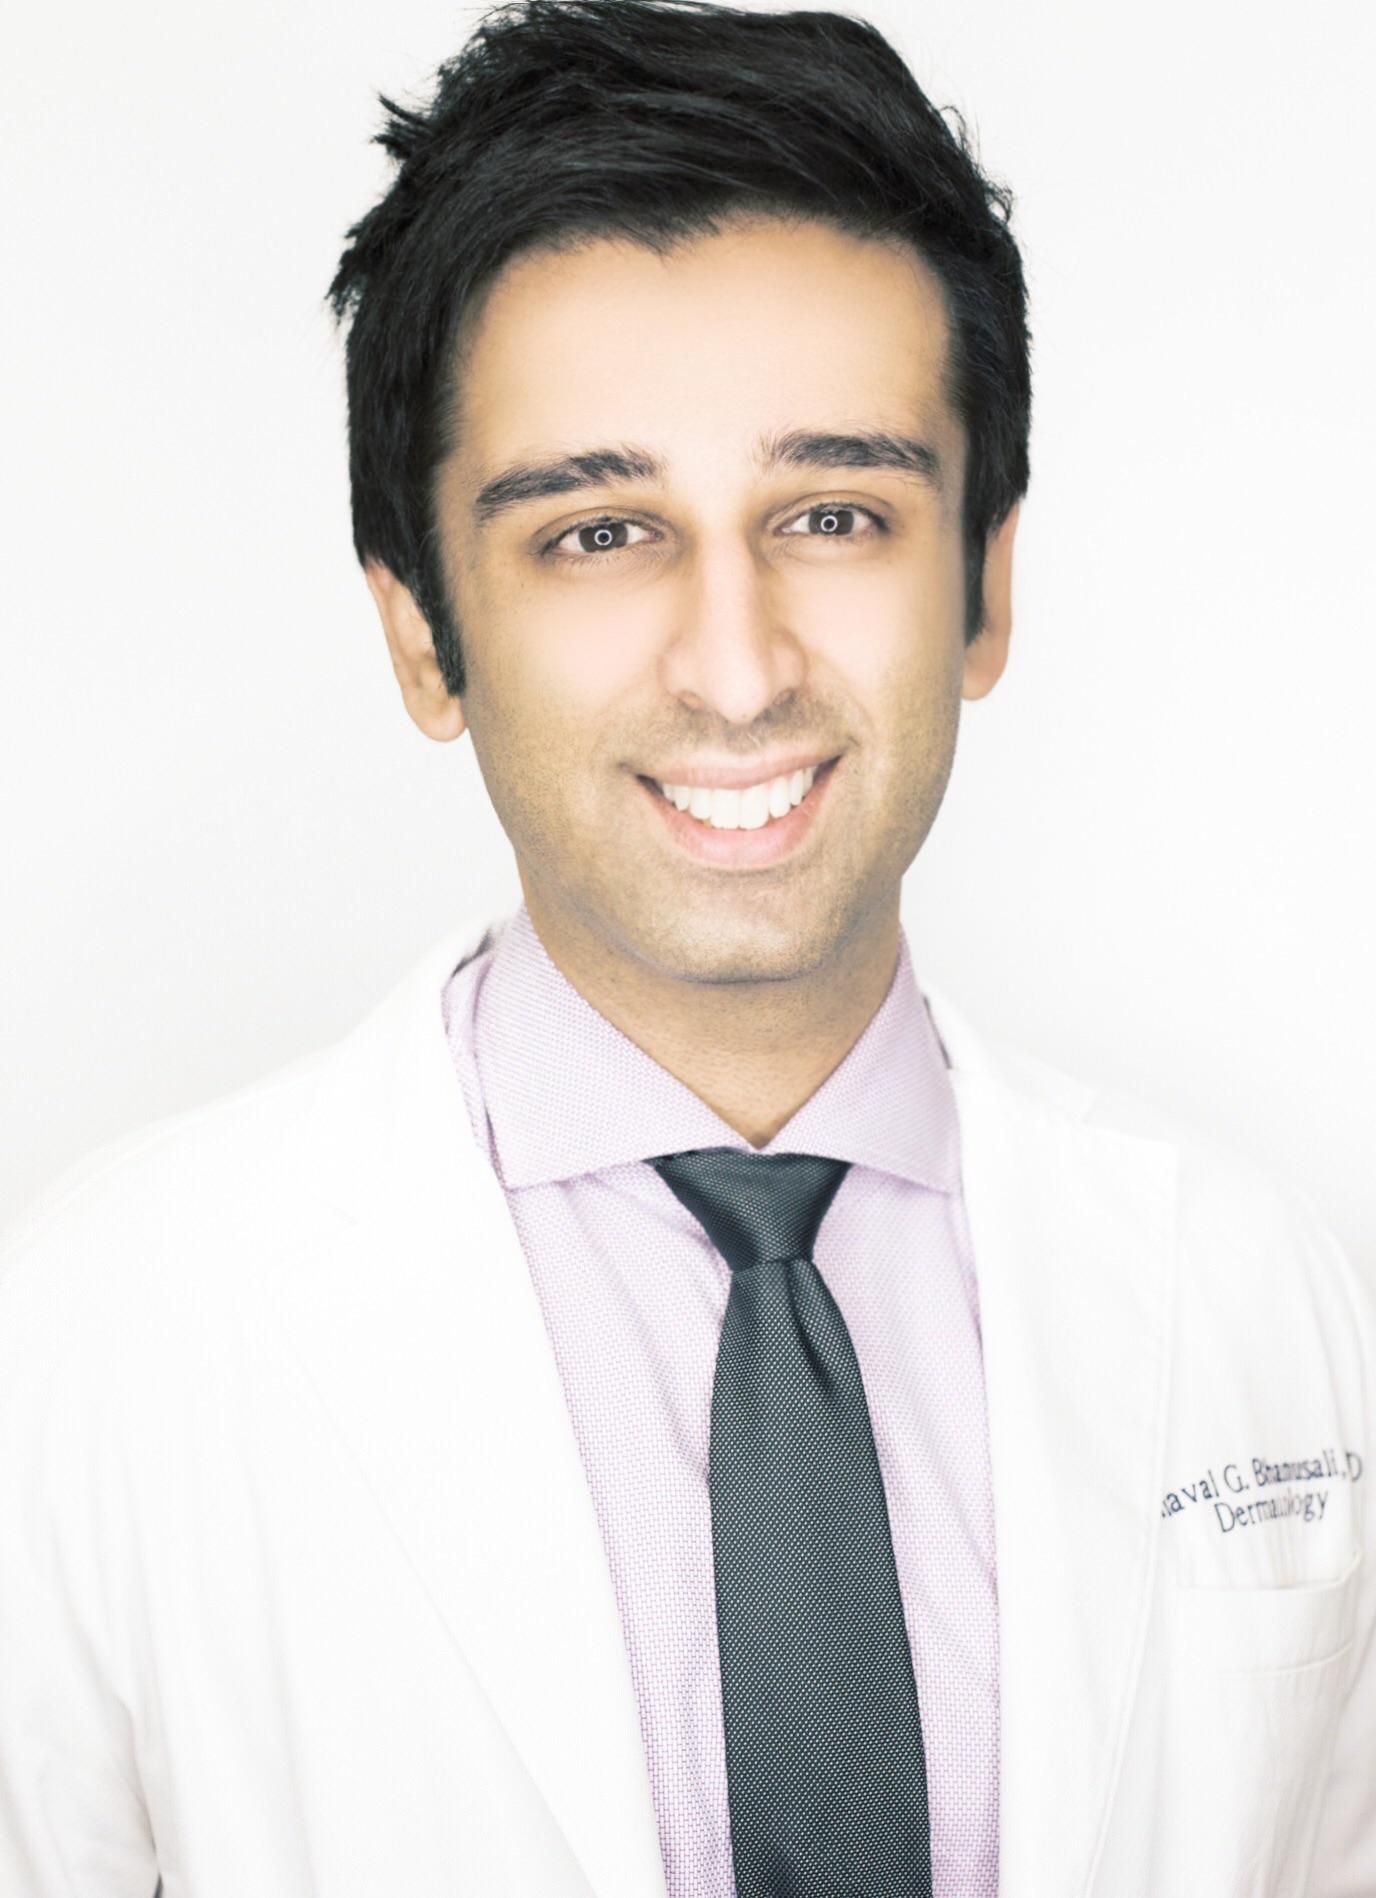 Dhaval G. Bhanusali, MD